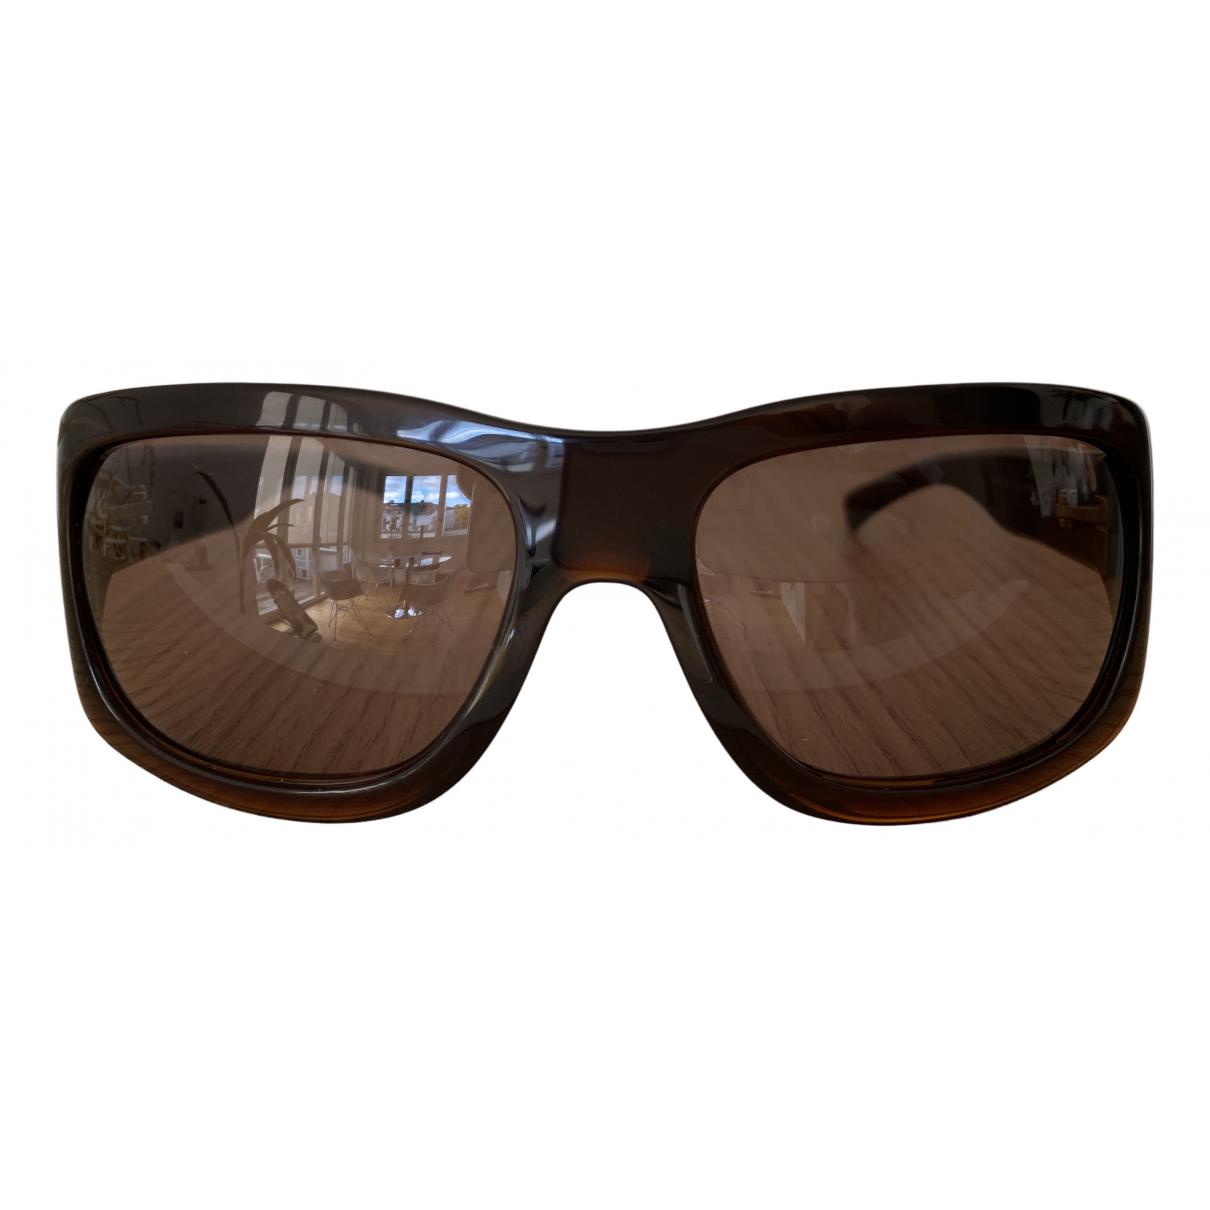 Bottega Veneta N Brown Sunglasses for Women N